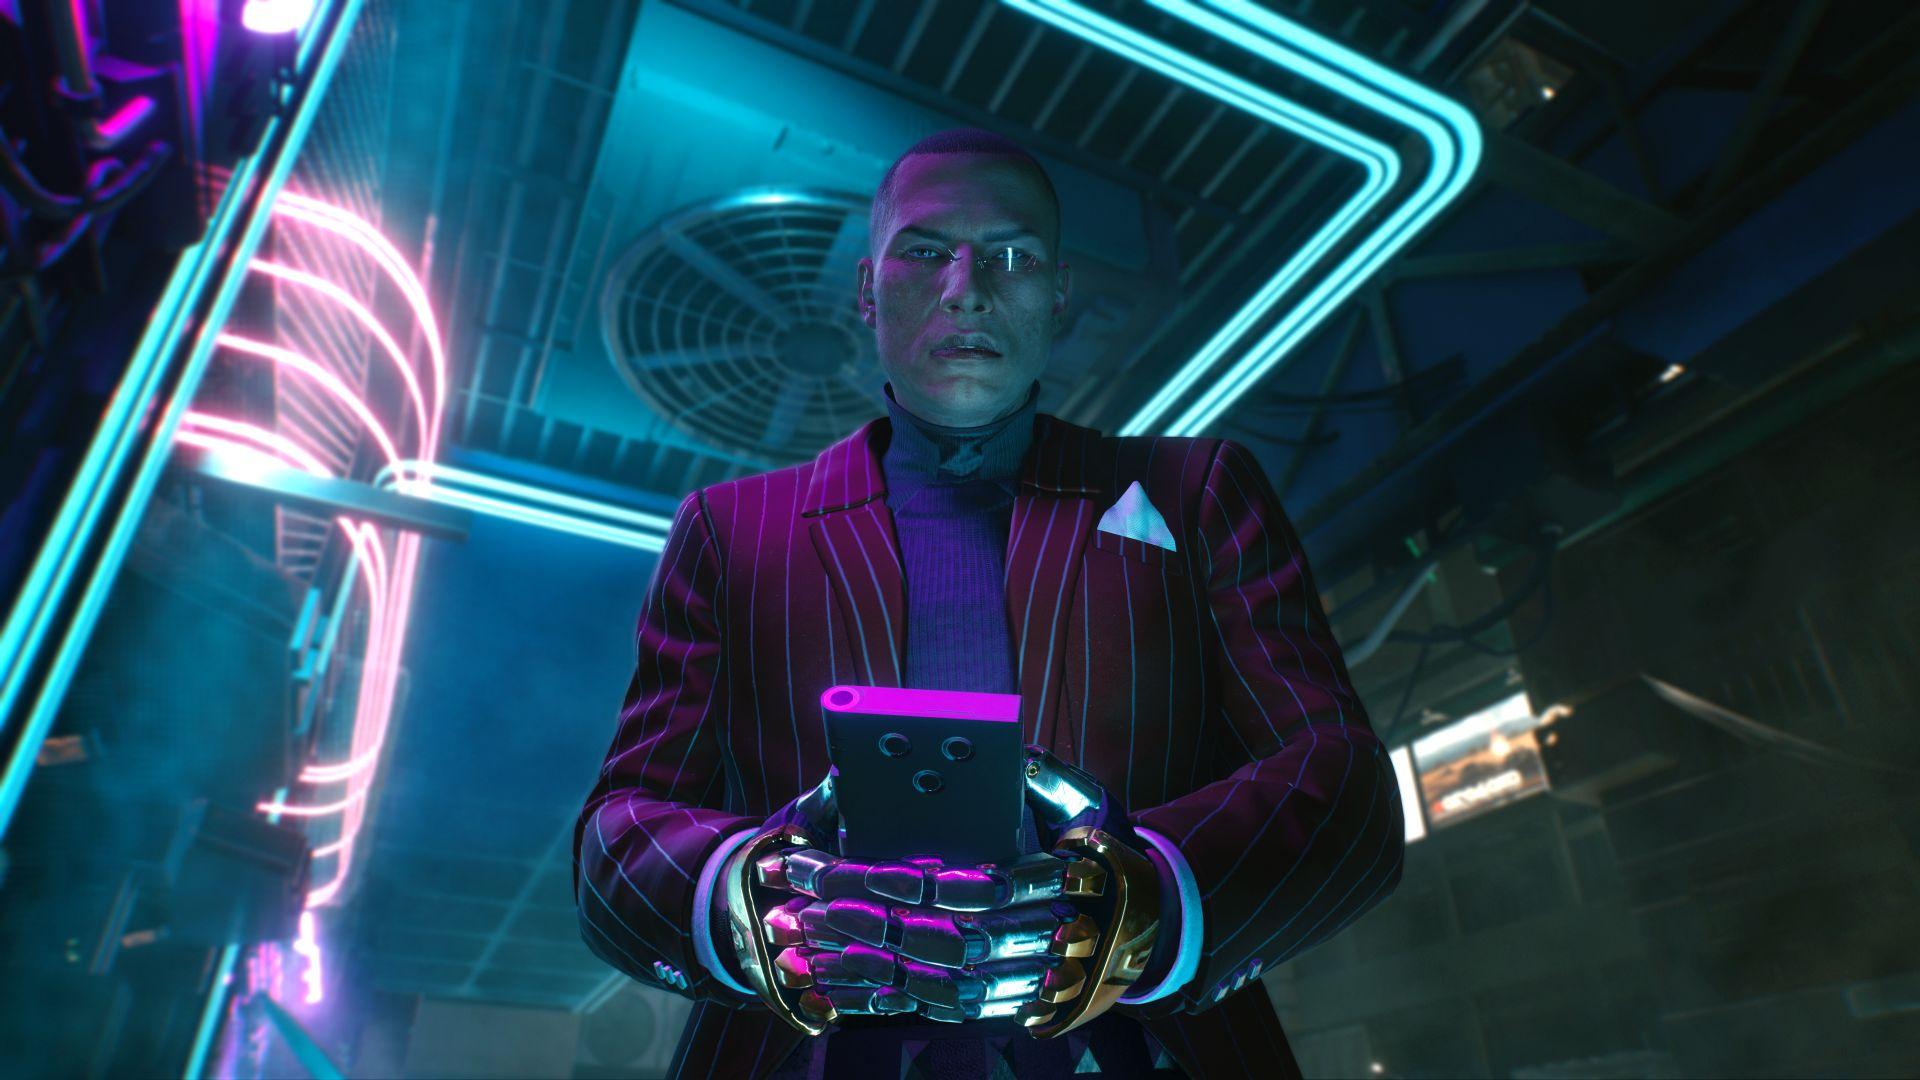 Cyberpunk 2077 steam key free